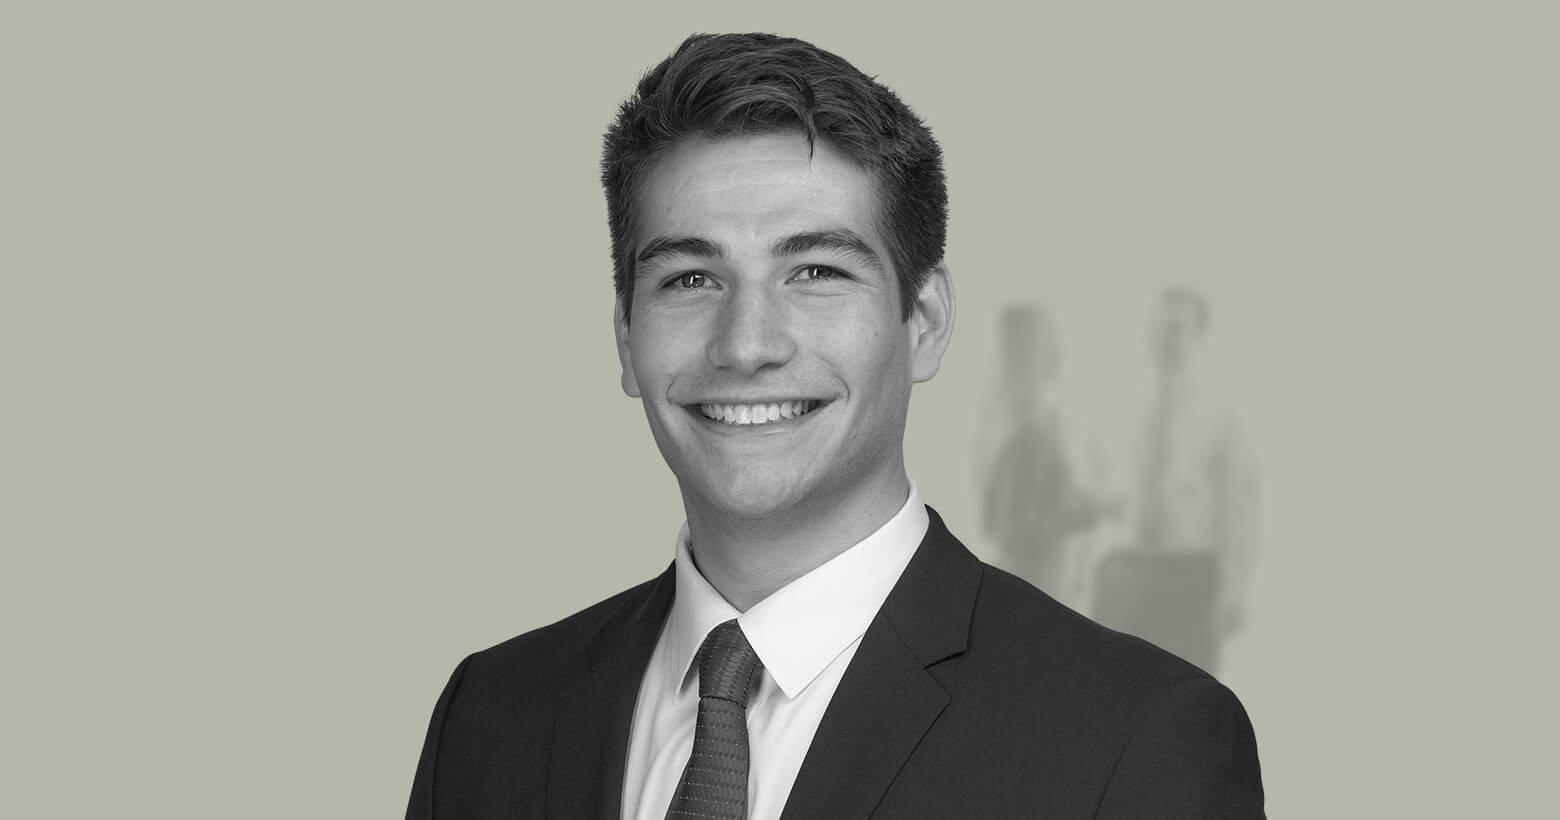 Matthew P. Drucker